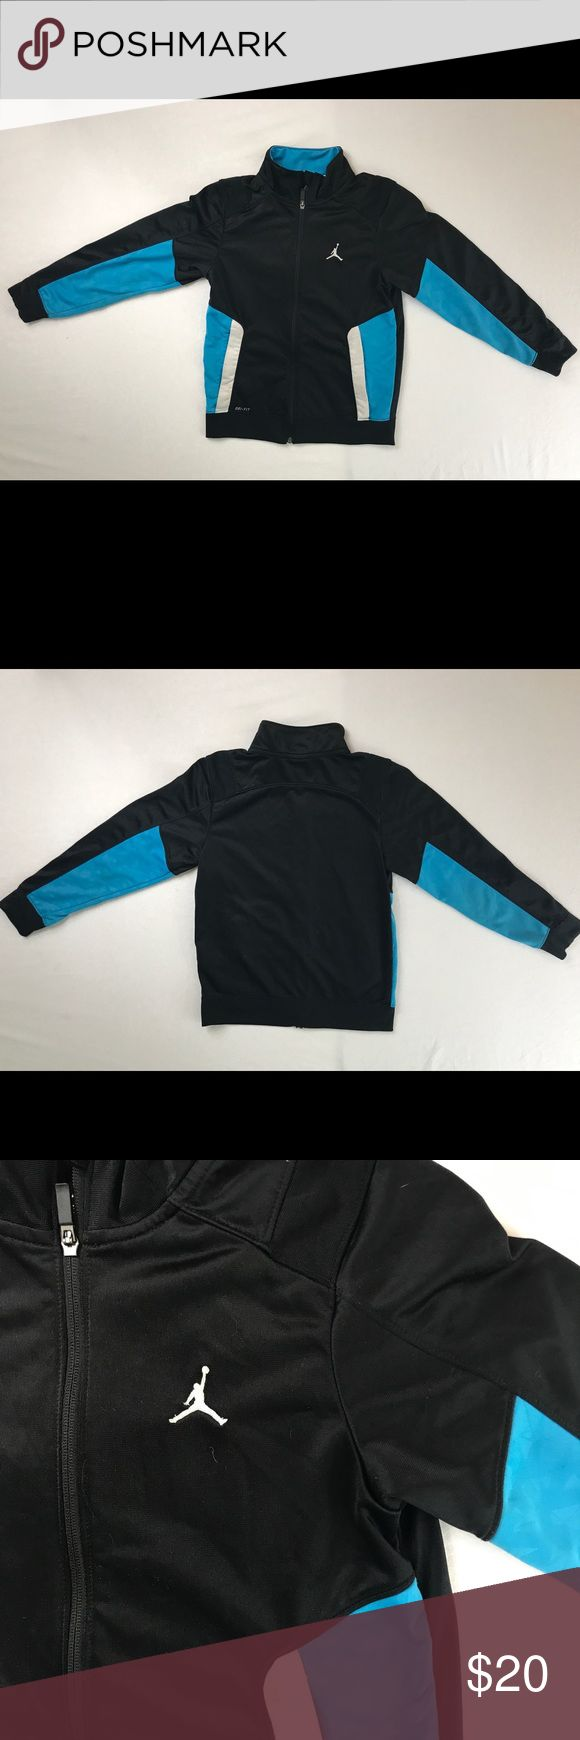 ♻️Nike Air Jordan Youth 10-12 full zip Jacket Nike Air Jordan full Zip athletic basketball jacket   Size - Medium (10-12)  Color - Black/Blue/White   Excellent Condition Nike Shirts & Tops Sweatshirts & Hoodies